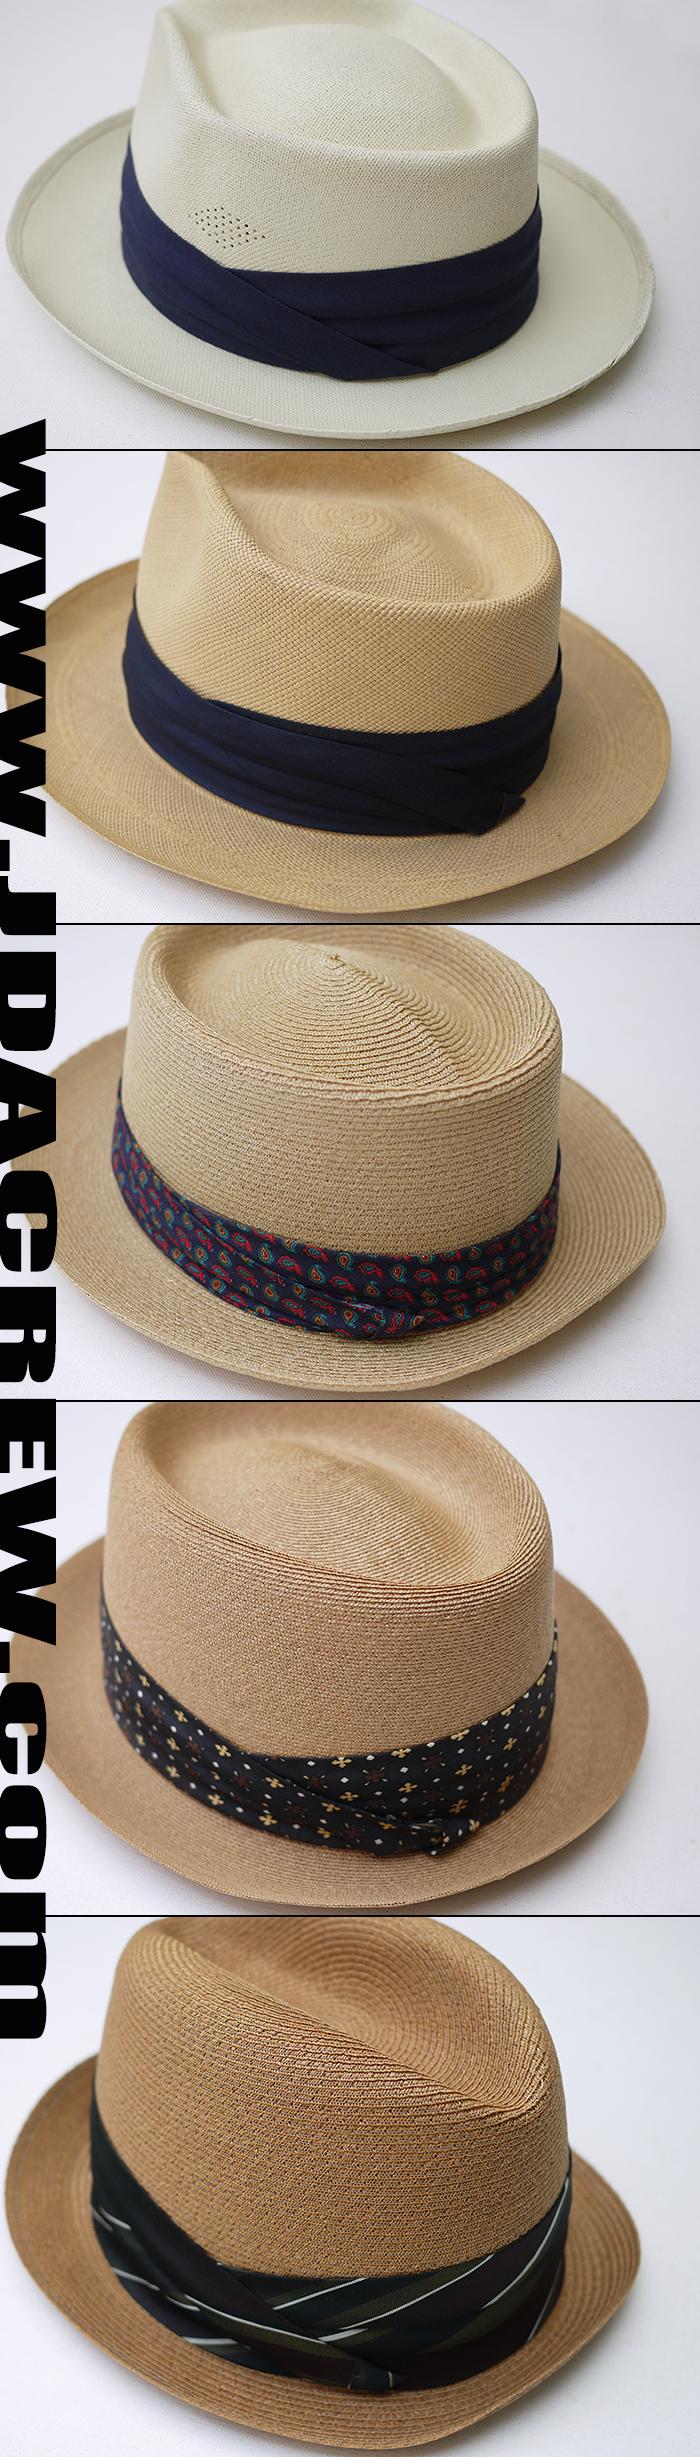 stetson panama hat straw hat borsalino dobbs 2016 jdacretakeoverdashit